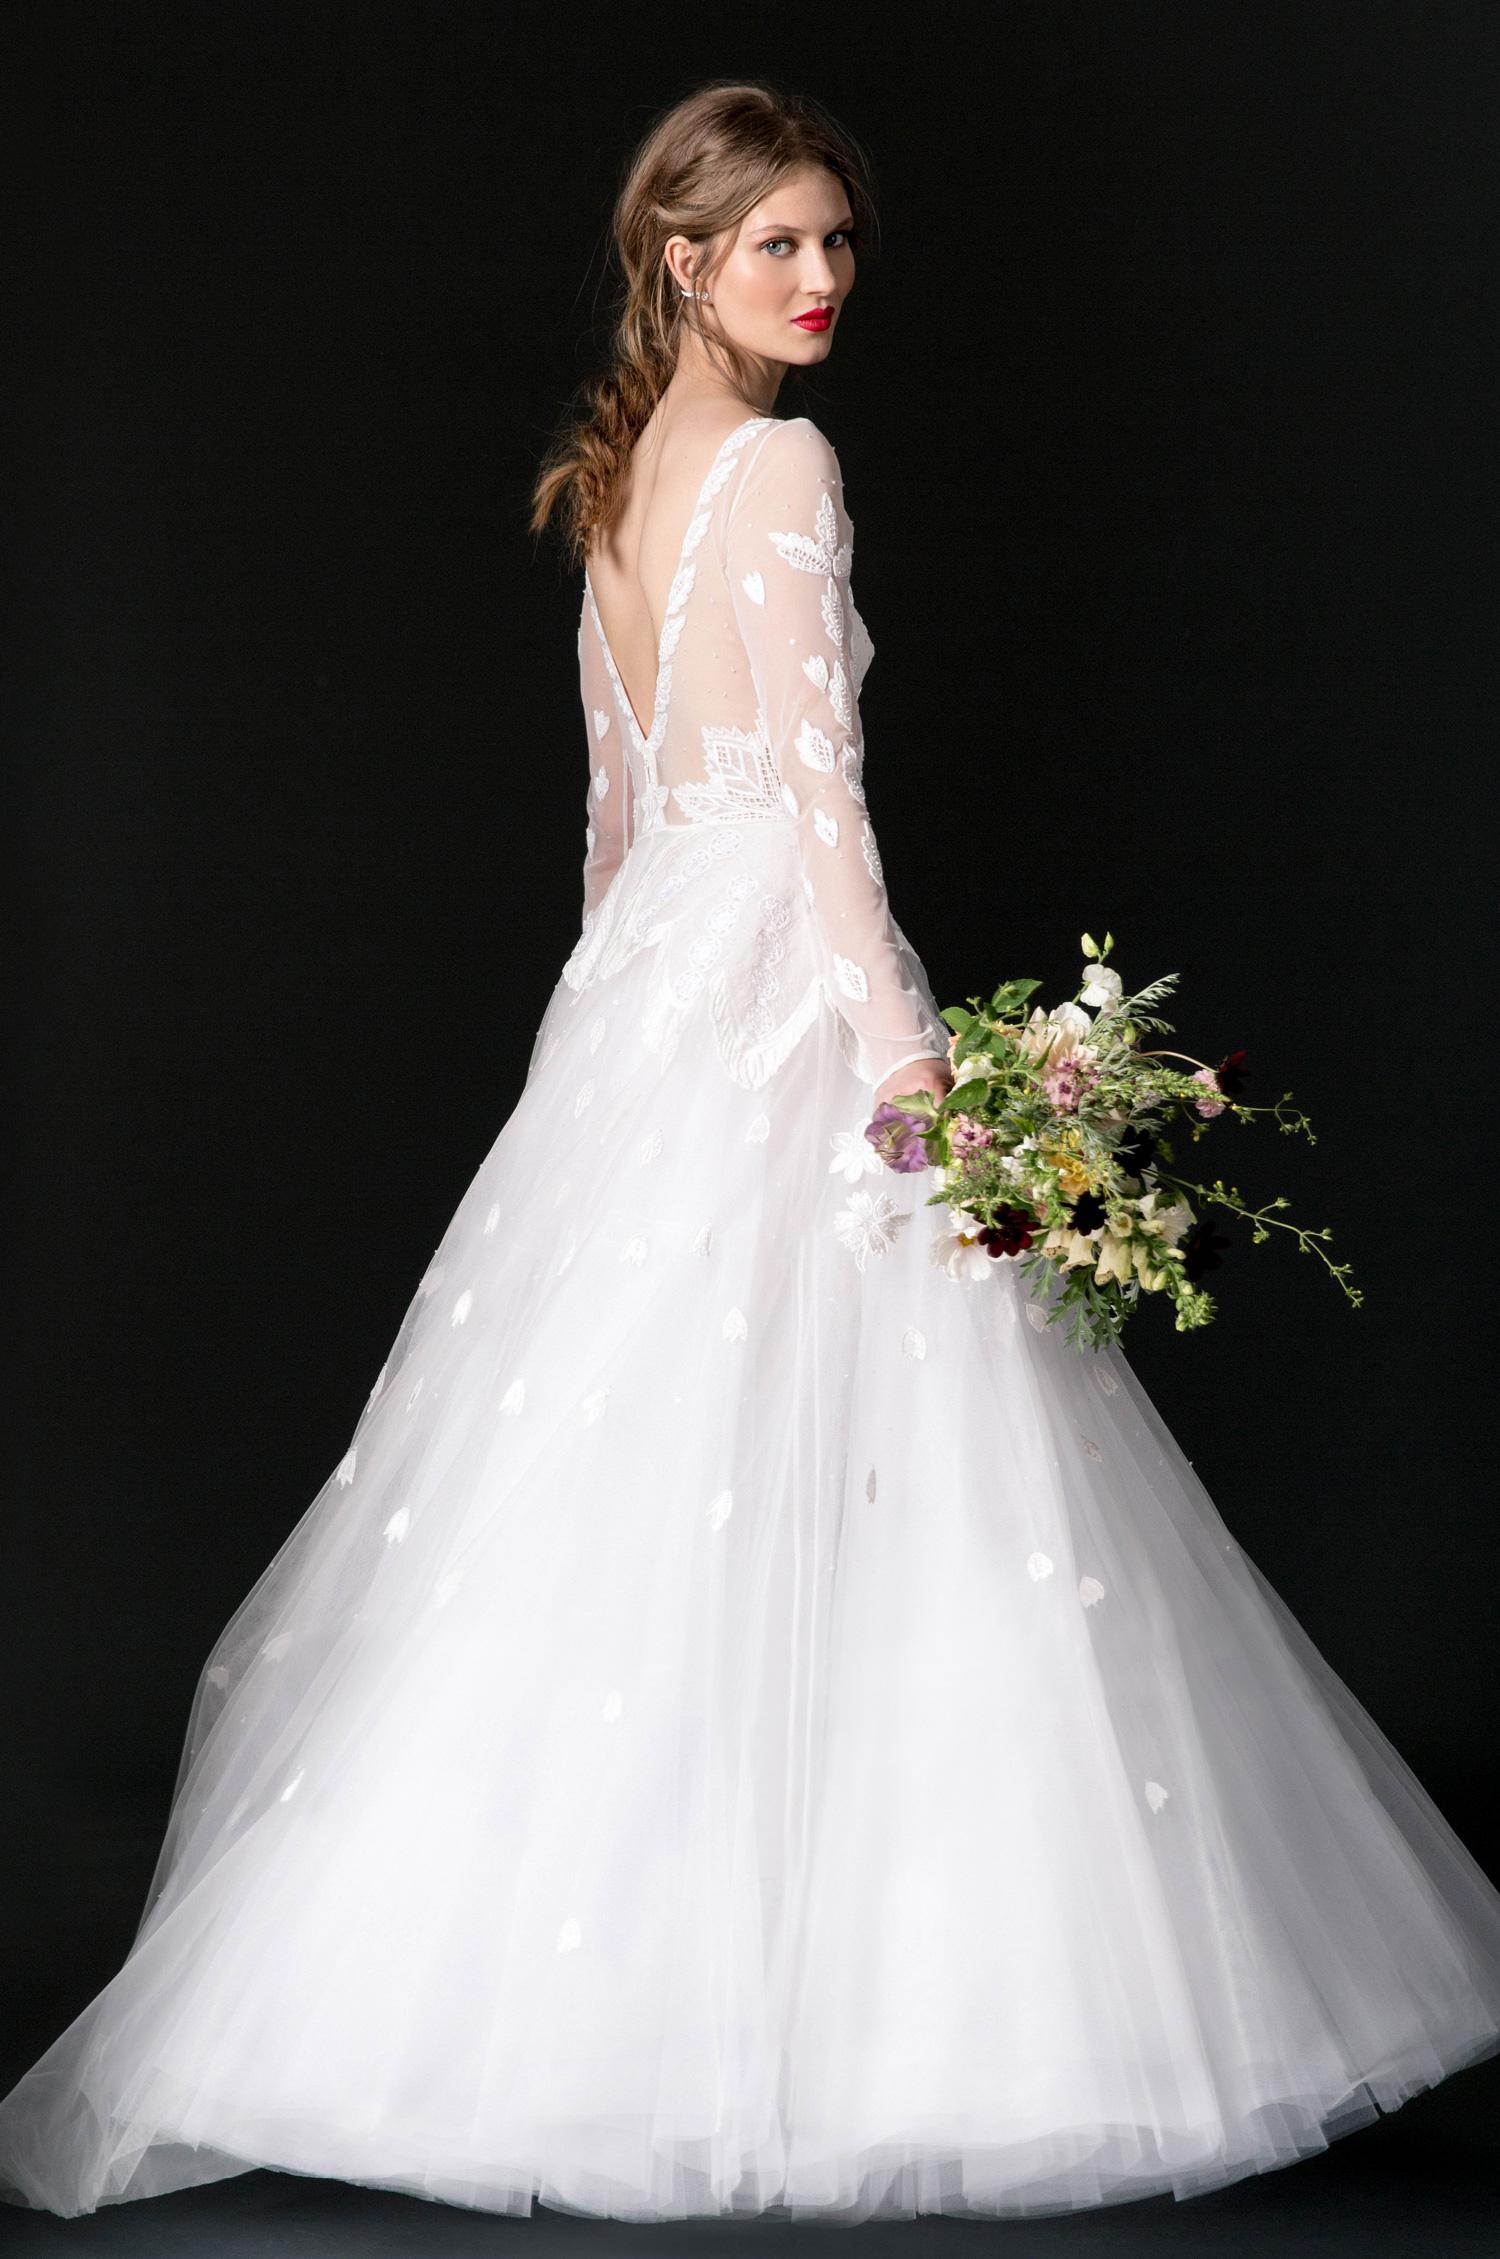 temperley wedding dress fall 2018 long sleeve lace a-line